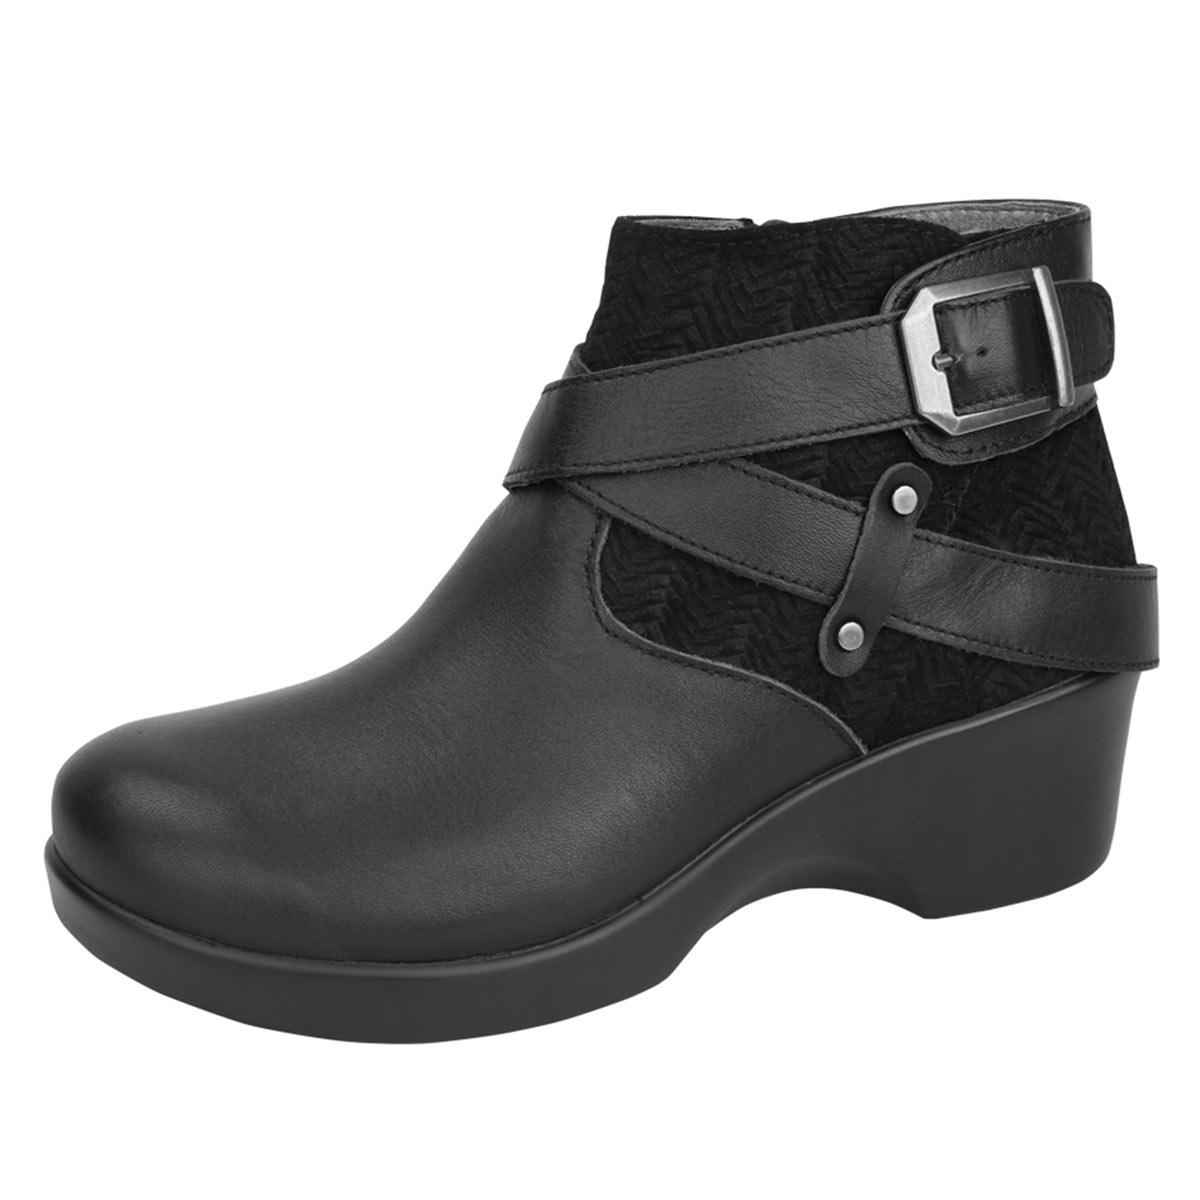 Alegria Shoes Eva Black Nappa Boots Free Shipping